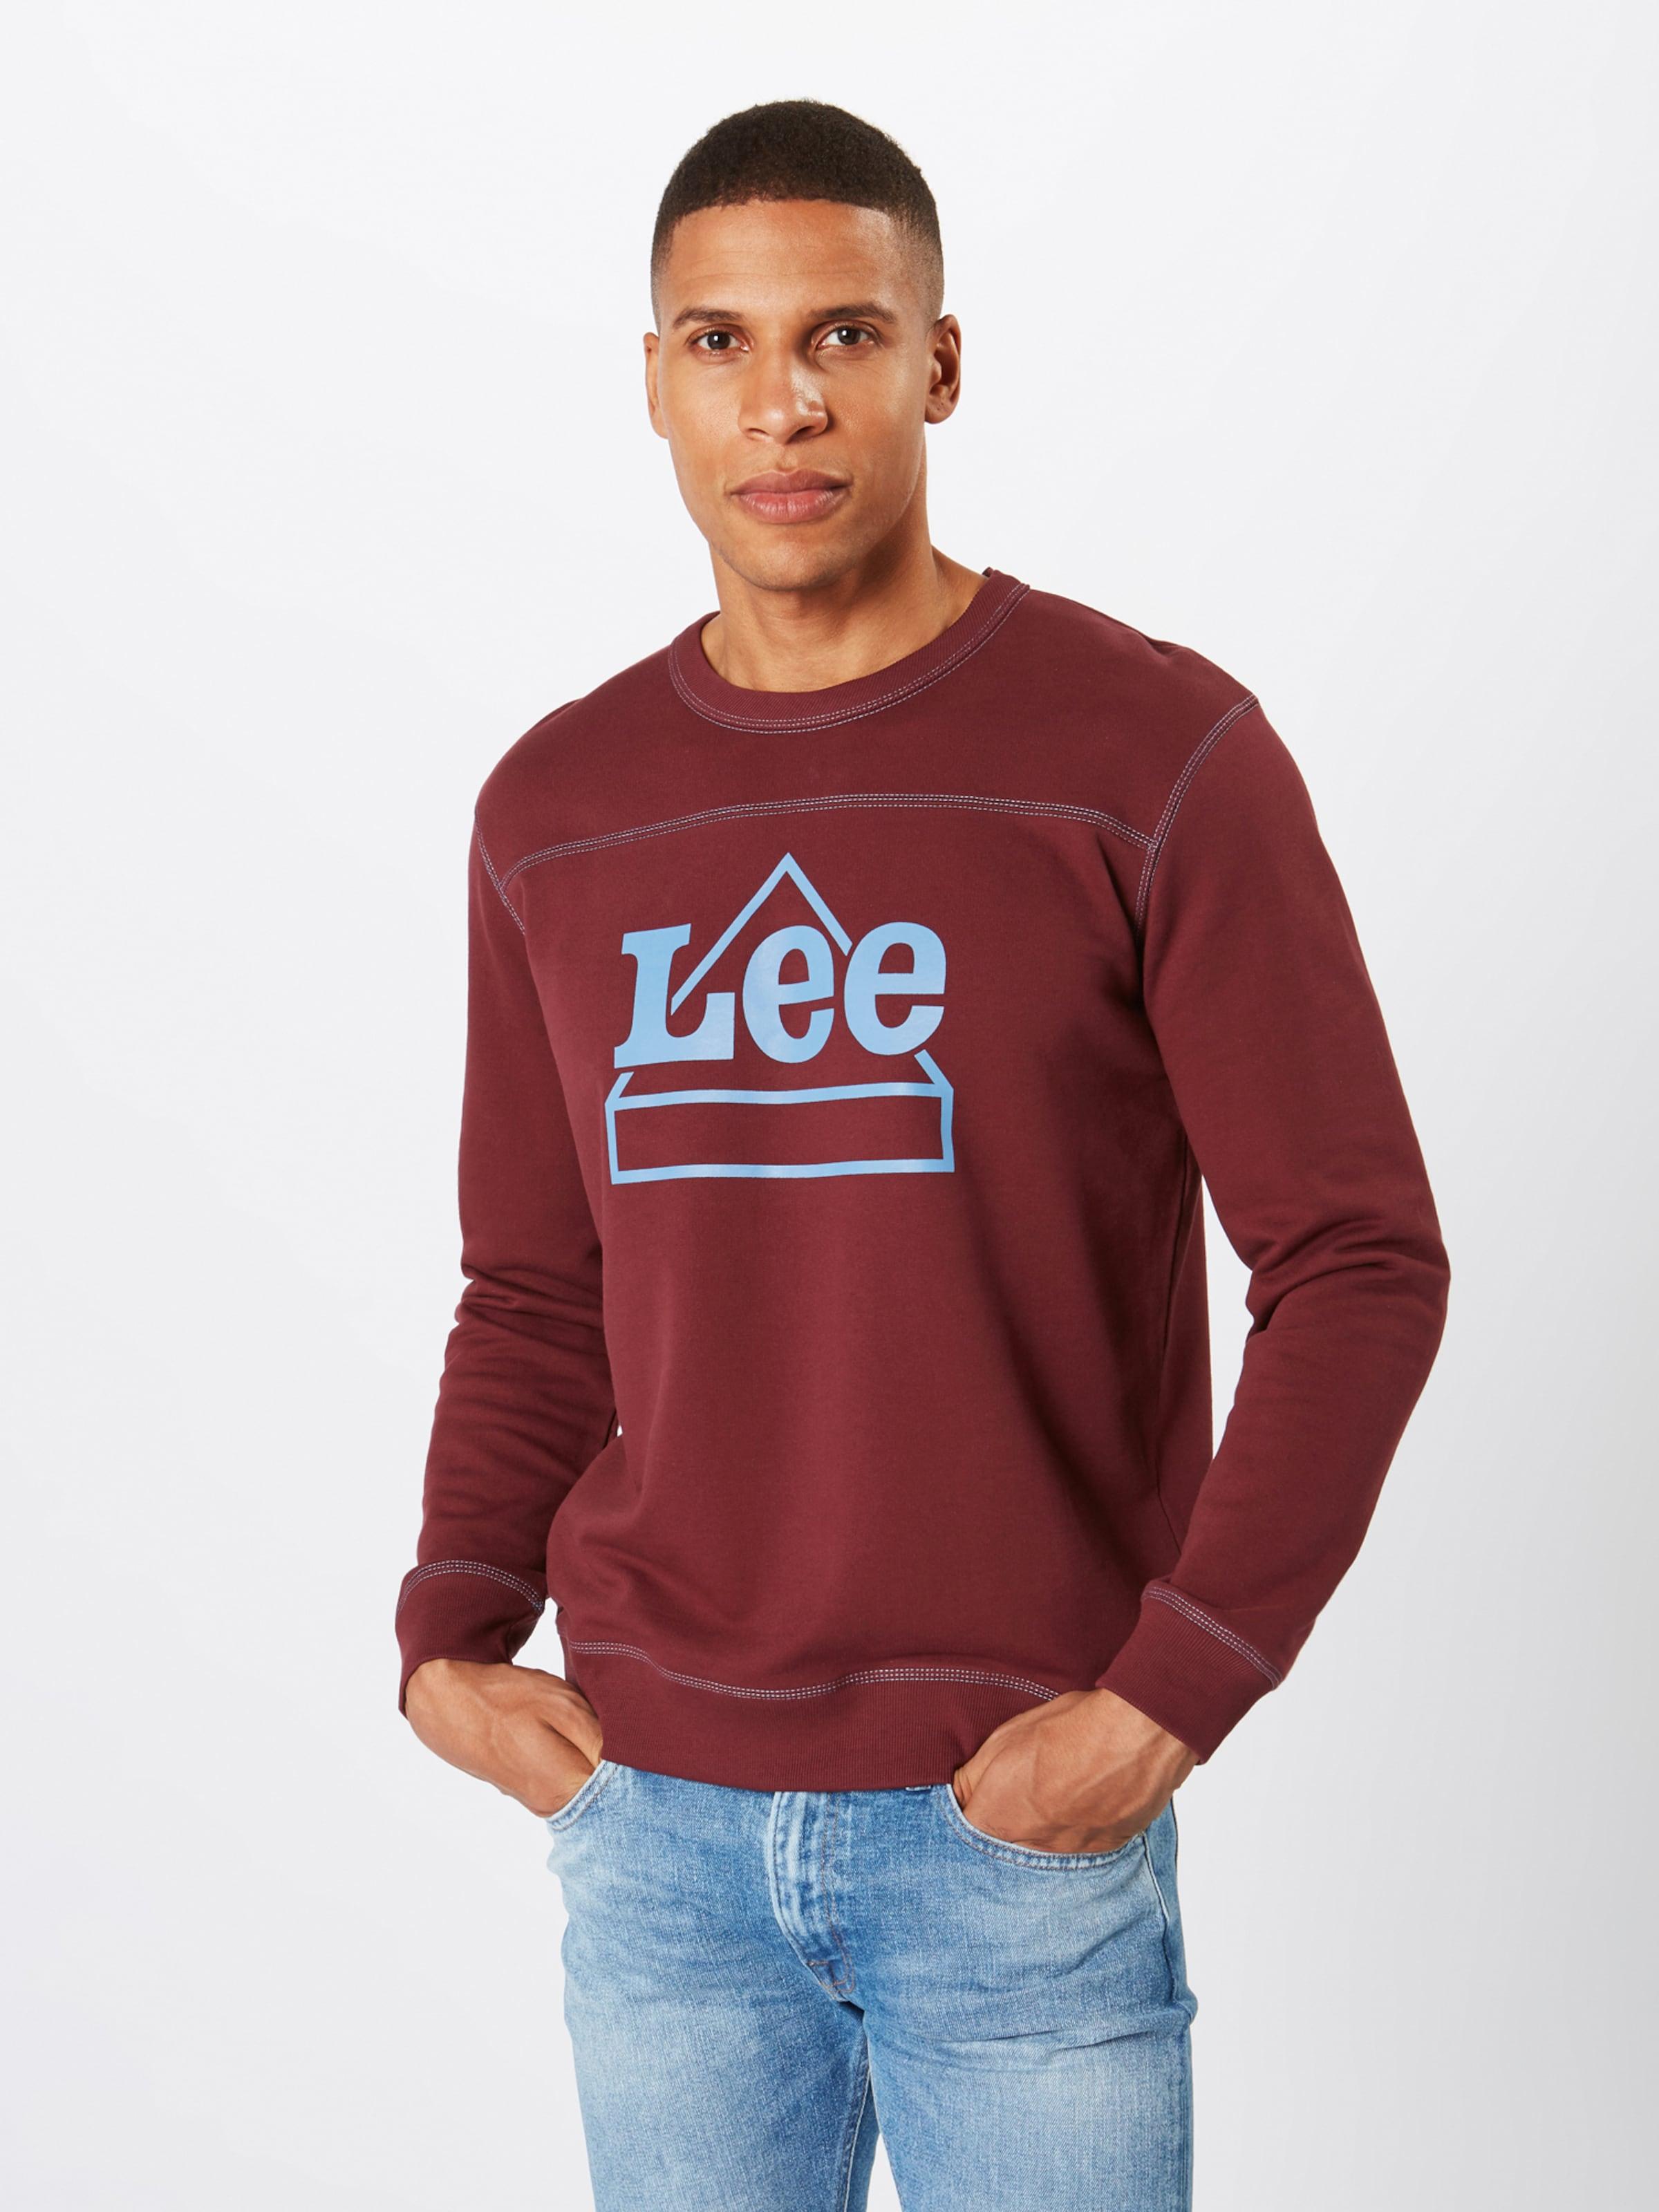 ClairMerlot Sws' shirt En Lee Sweat Bleu 'graphic 76vgfIbyY